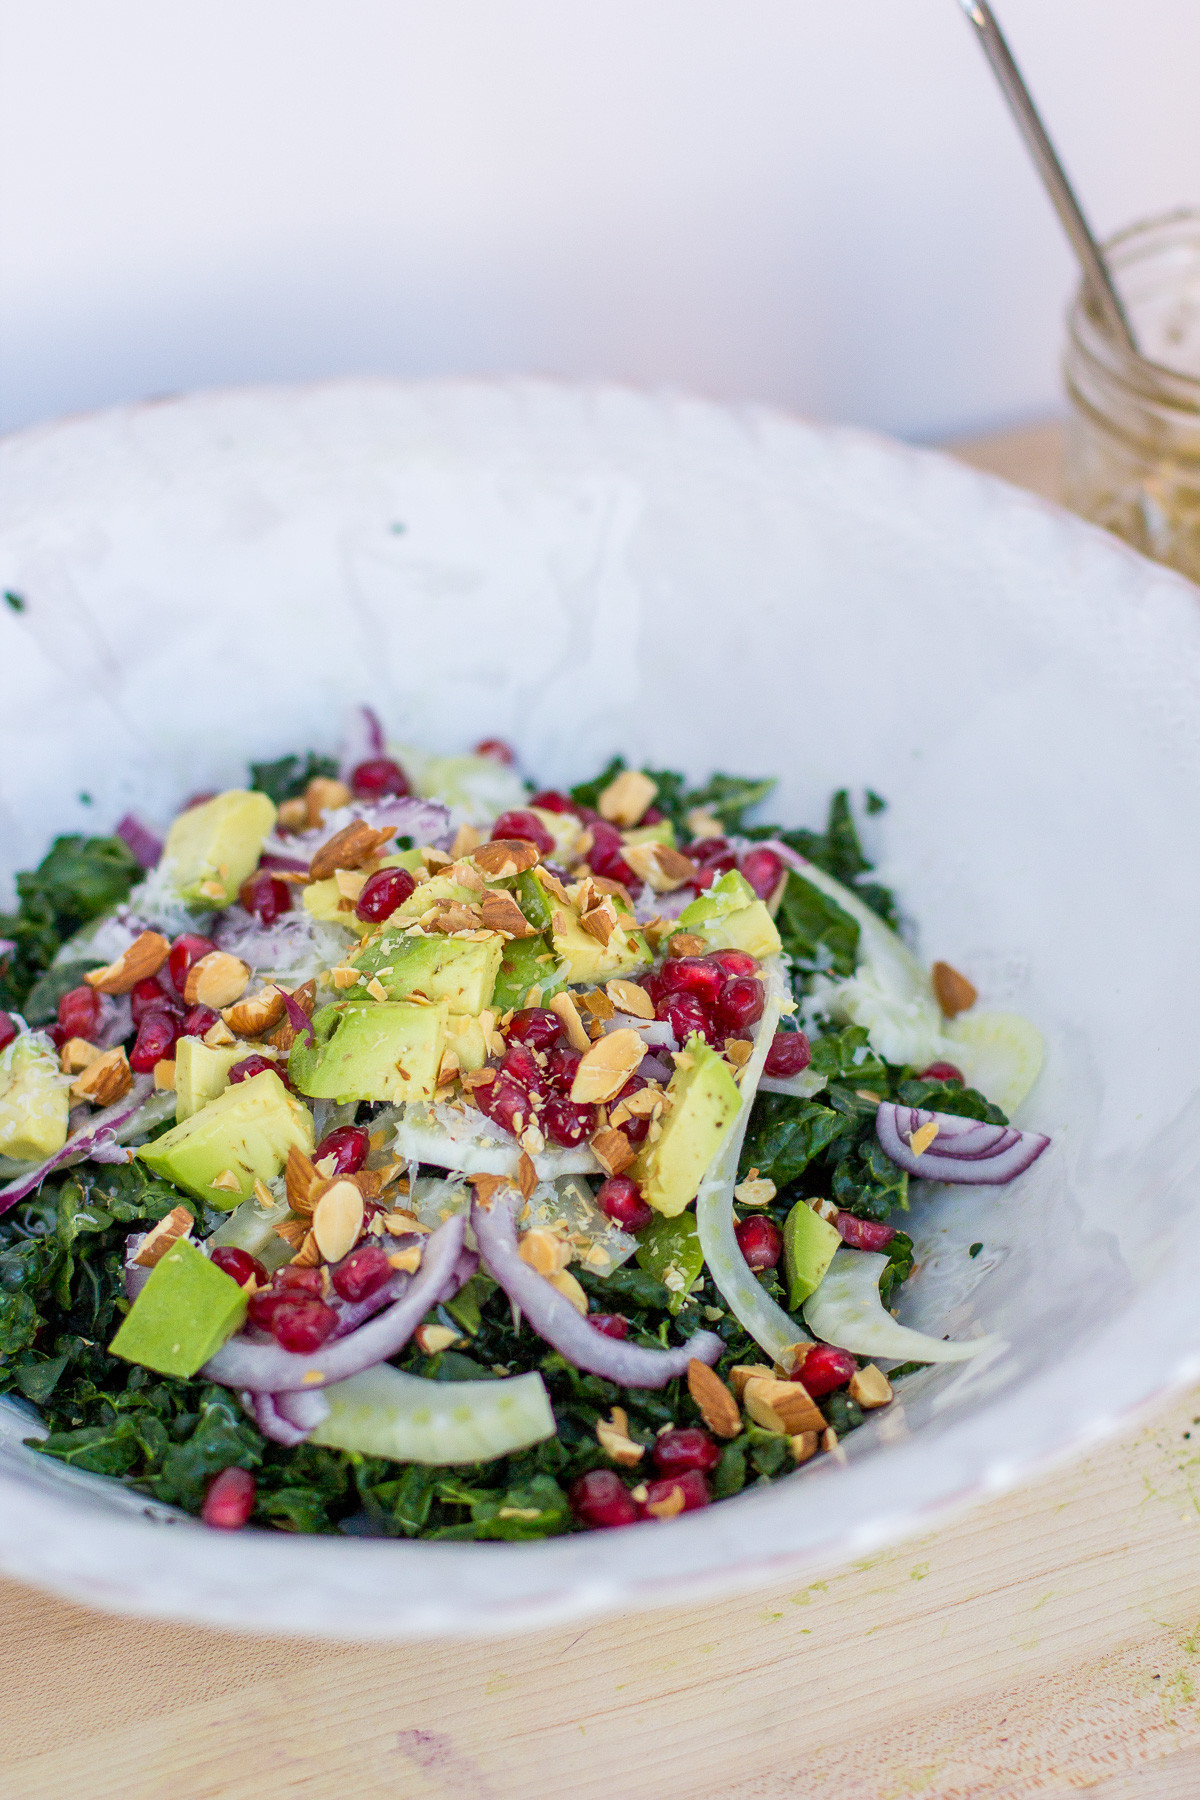 Kale Recipes Easy Healthy  An Easy and Impressive Kale Salad Recipe — Wandeleur